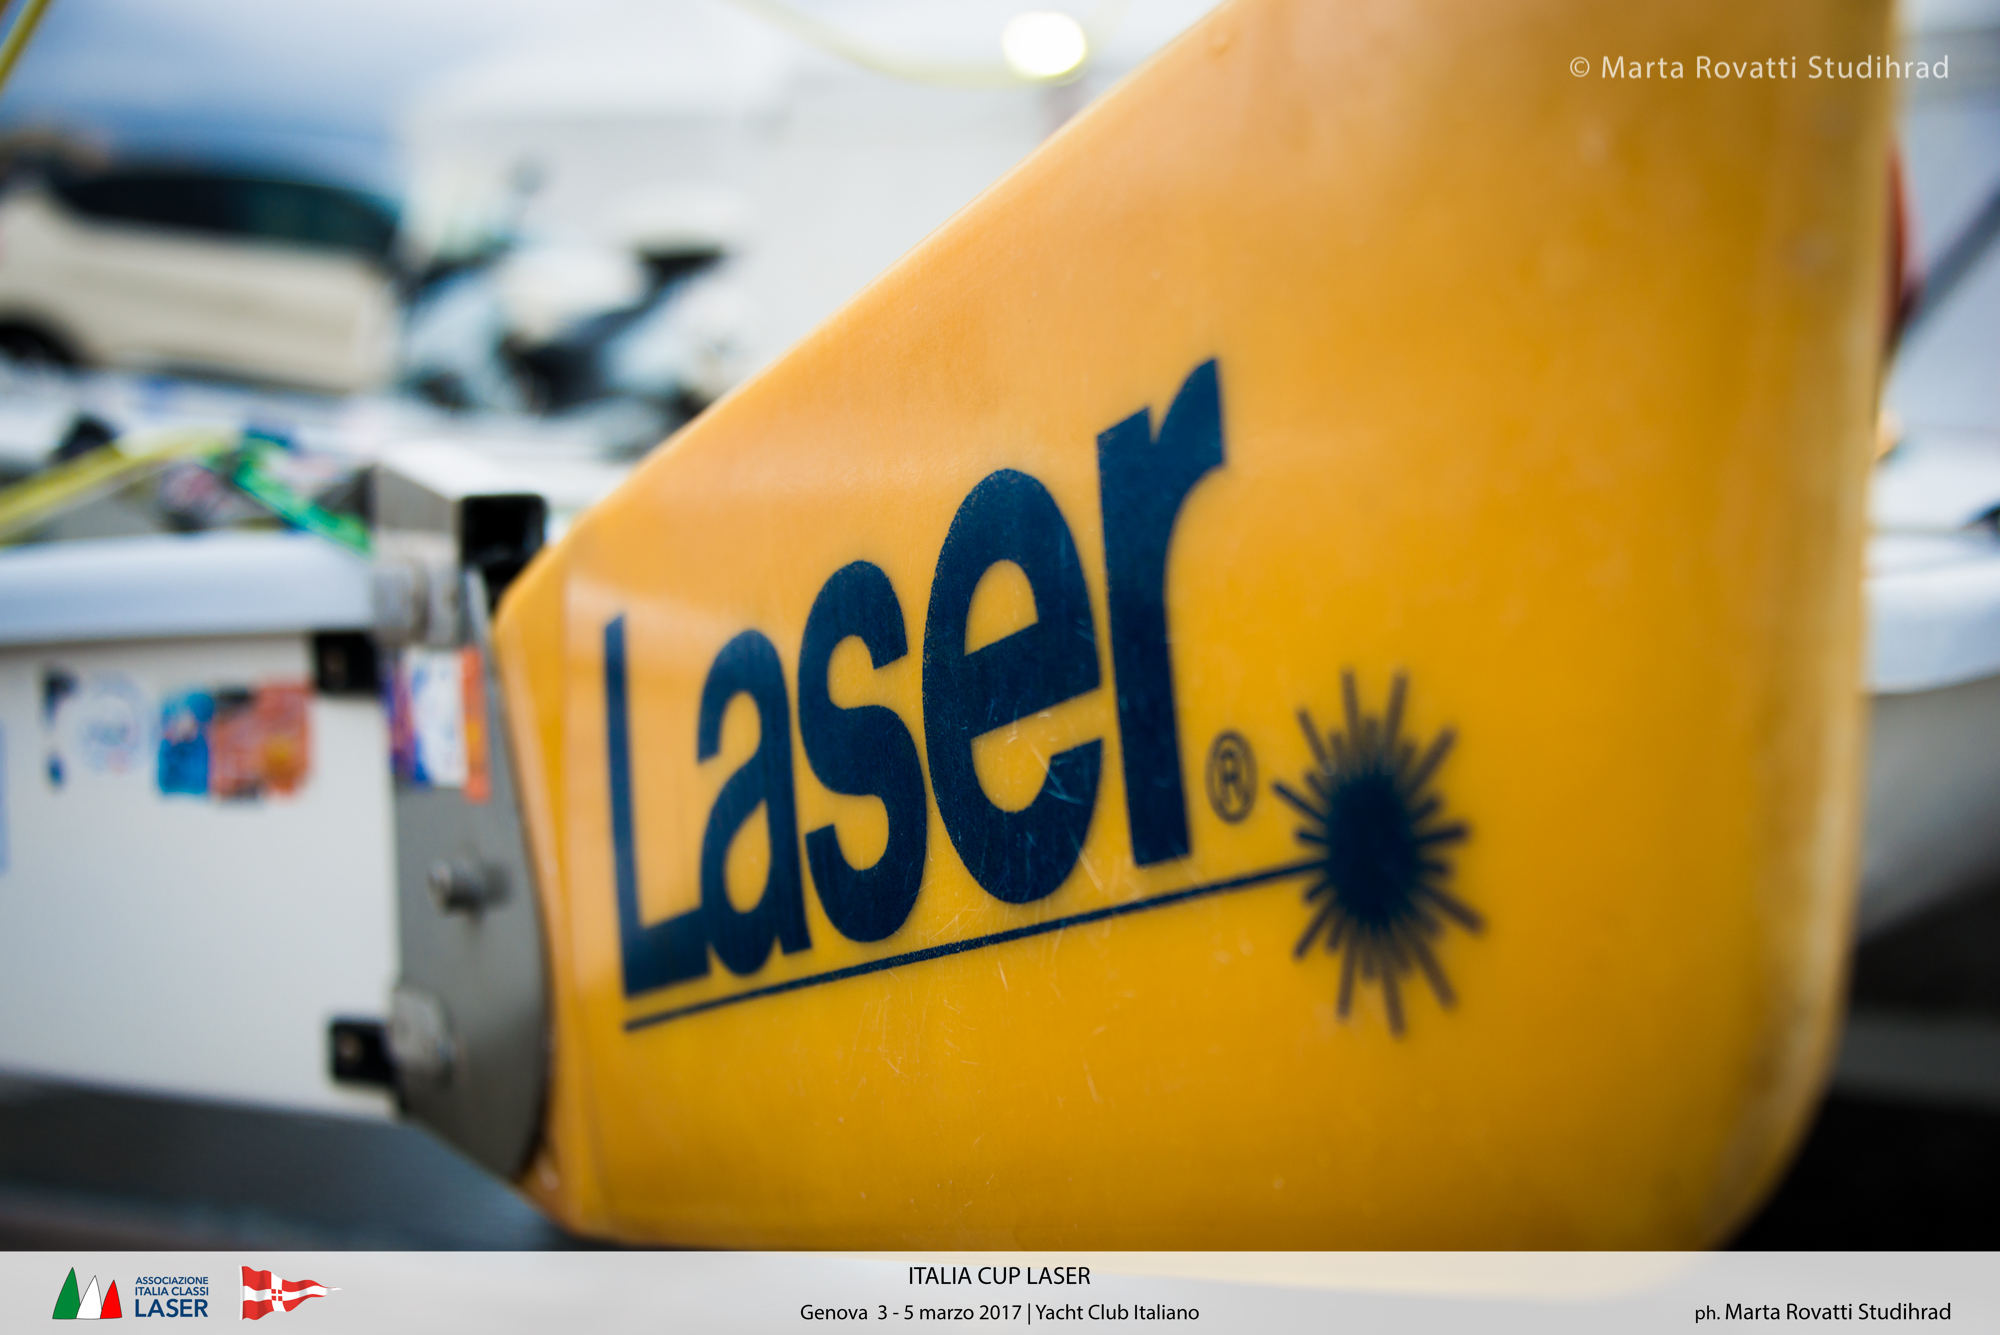 Associazione-Italia-Classi-Laser-2017-GenovaMGR_5704